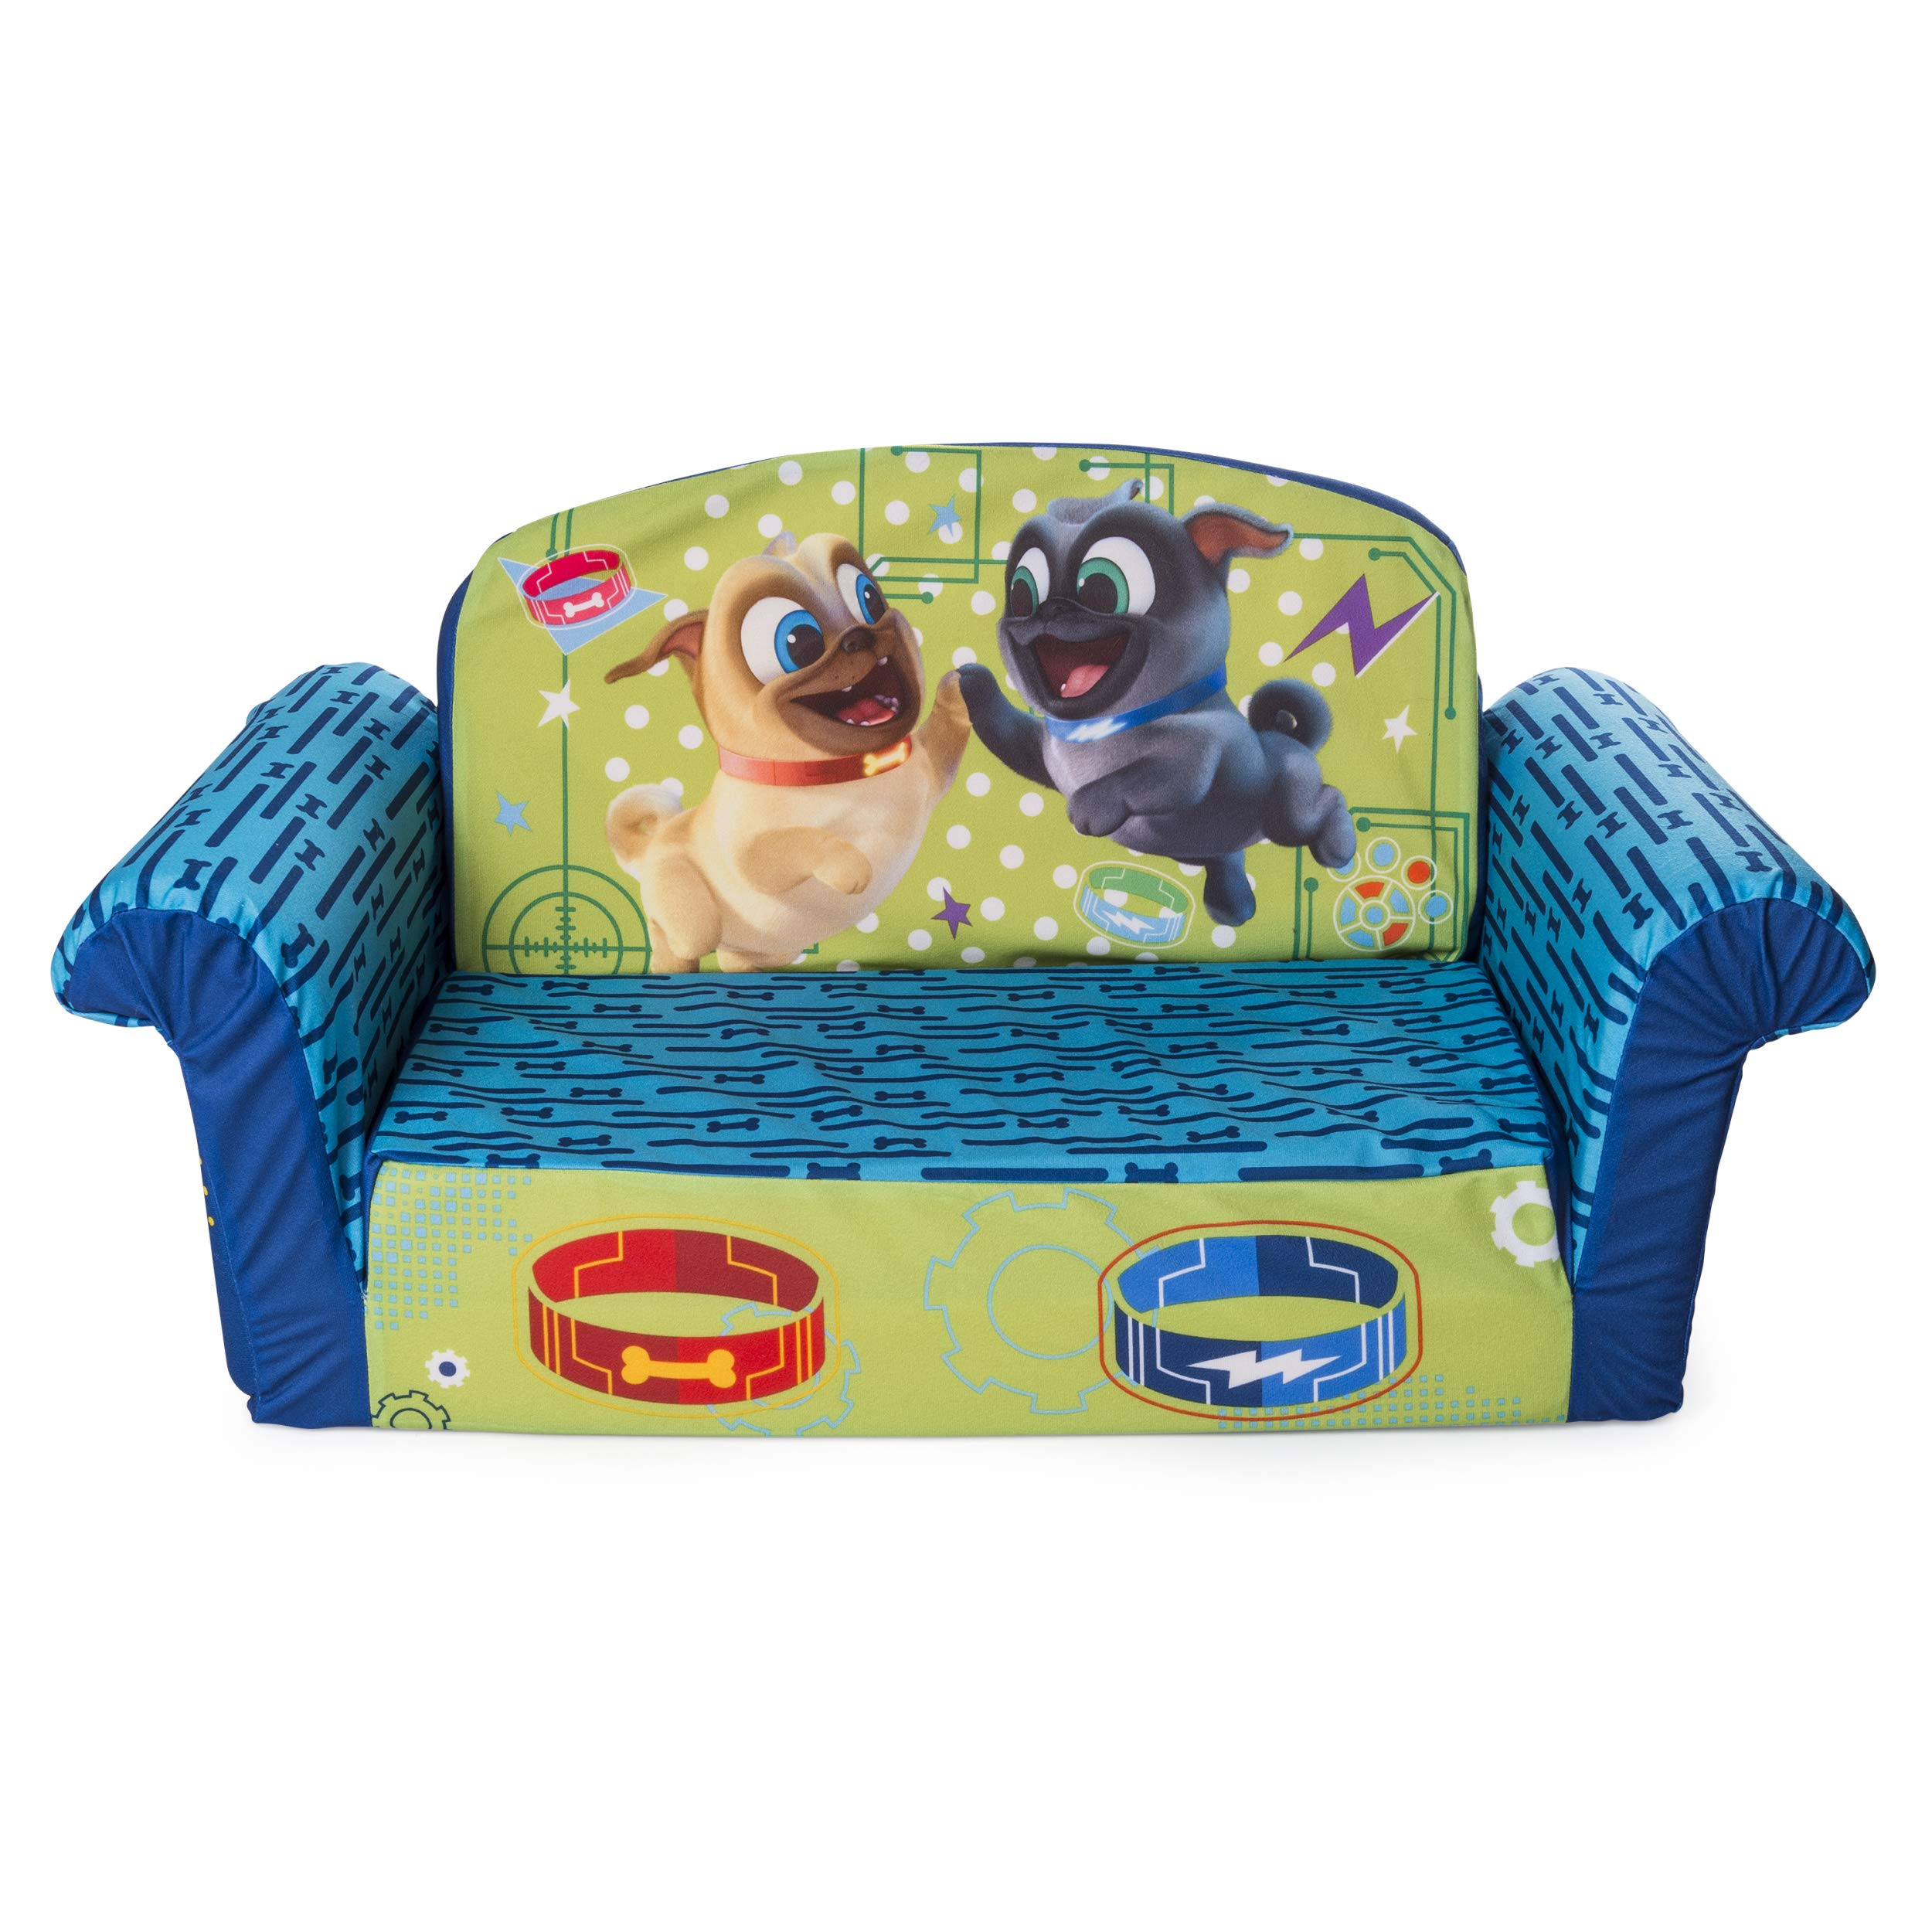 Marshmallow Furniture, Children's 2 in 1 Flip Open Foam Sofa, Disney's Puppy Dog Pals by Spin Master by Marshmallow Furniture